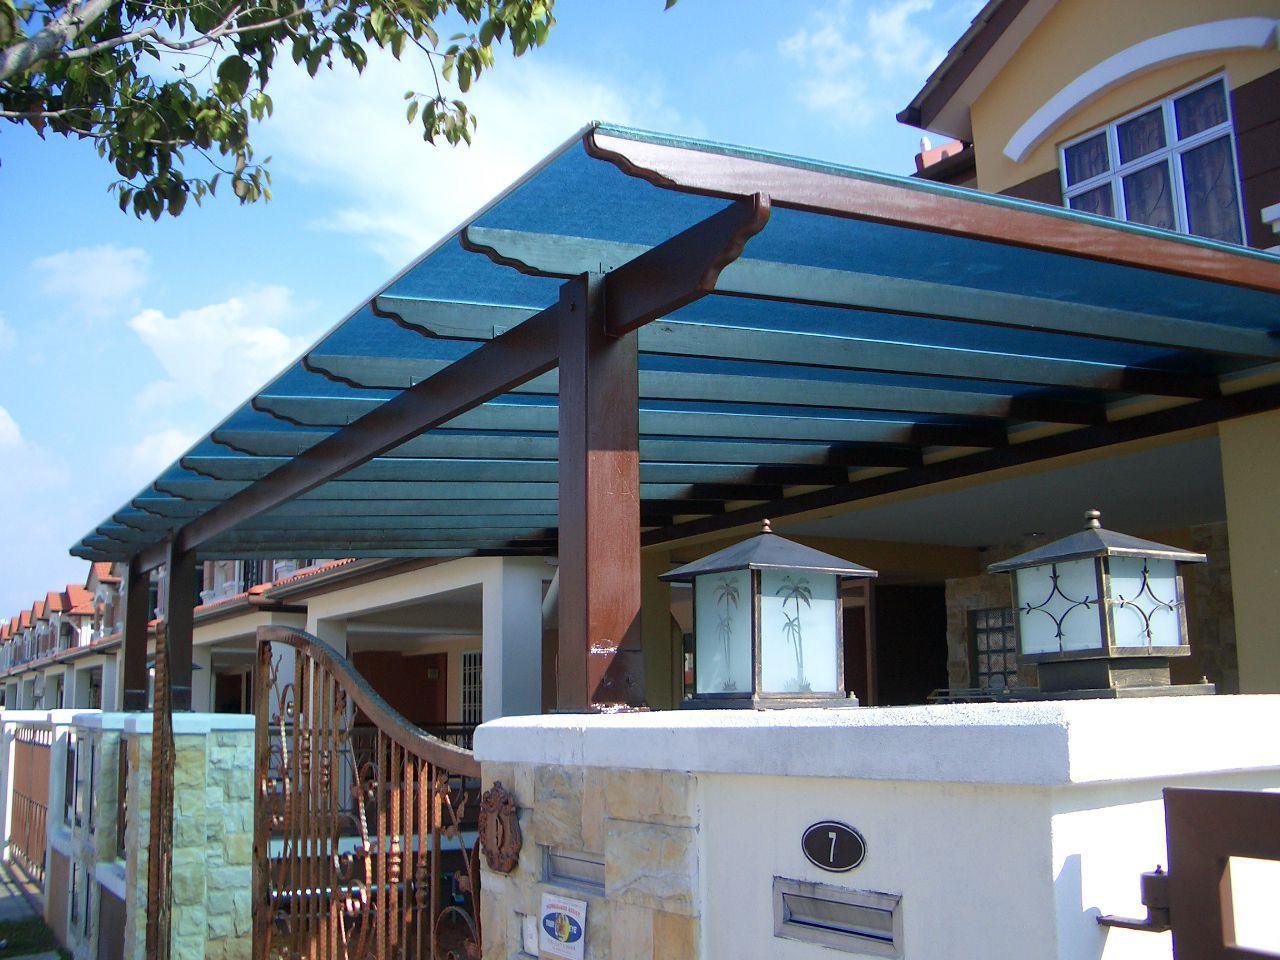 Patio canopy / polycarbonate / methacrylate / metal & Patio canopy / polycarbonate / methacrylate / metal - Polimer Tecnic